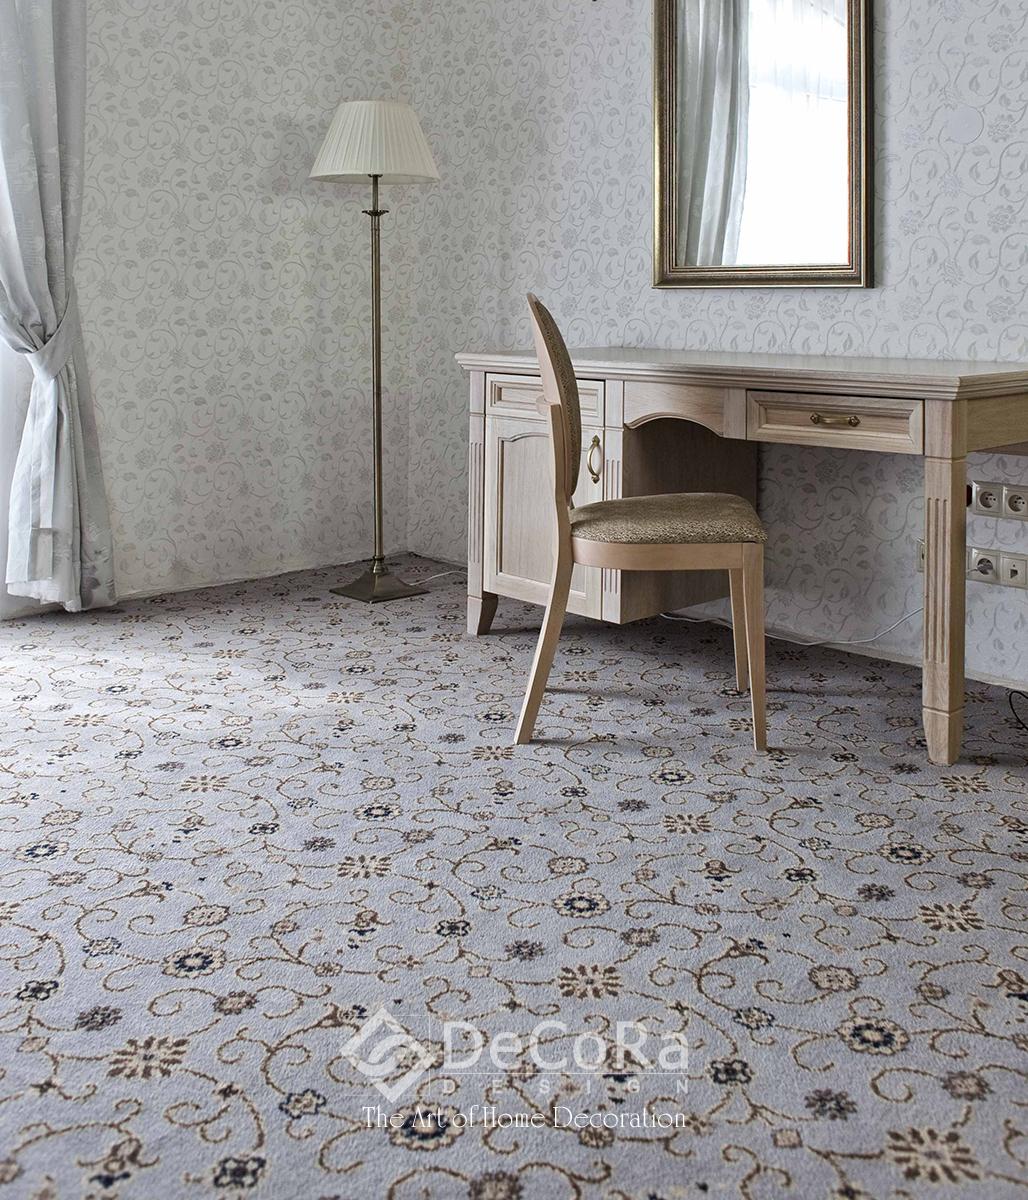 moquettes h tel et rev tements aiguillet es tuft es. Black Bedroom Furniture Sets. Home Design Ideas